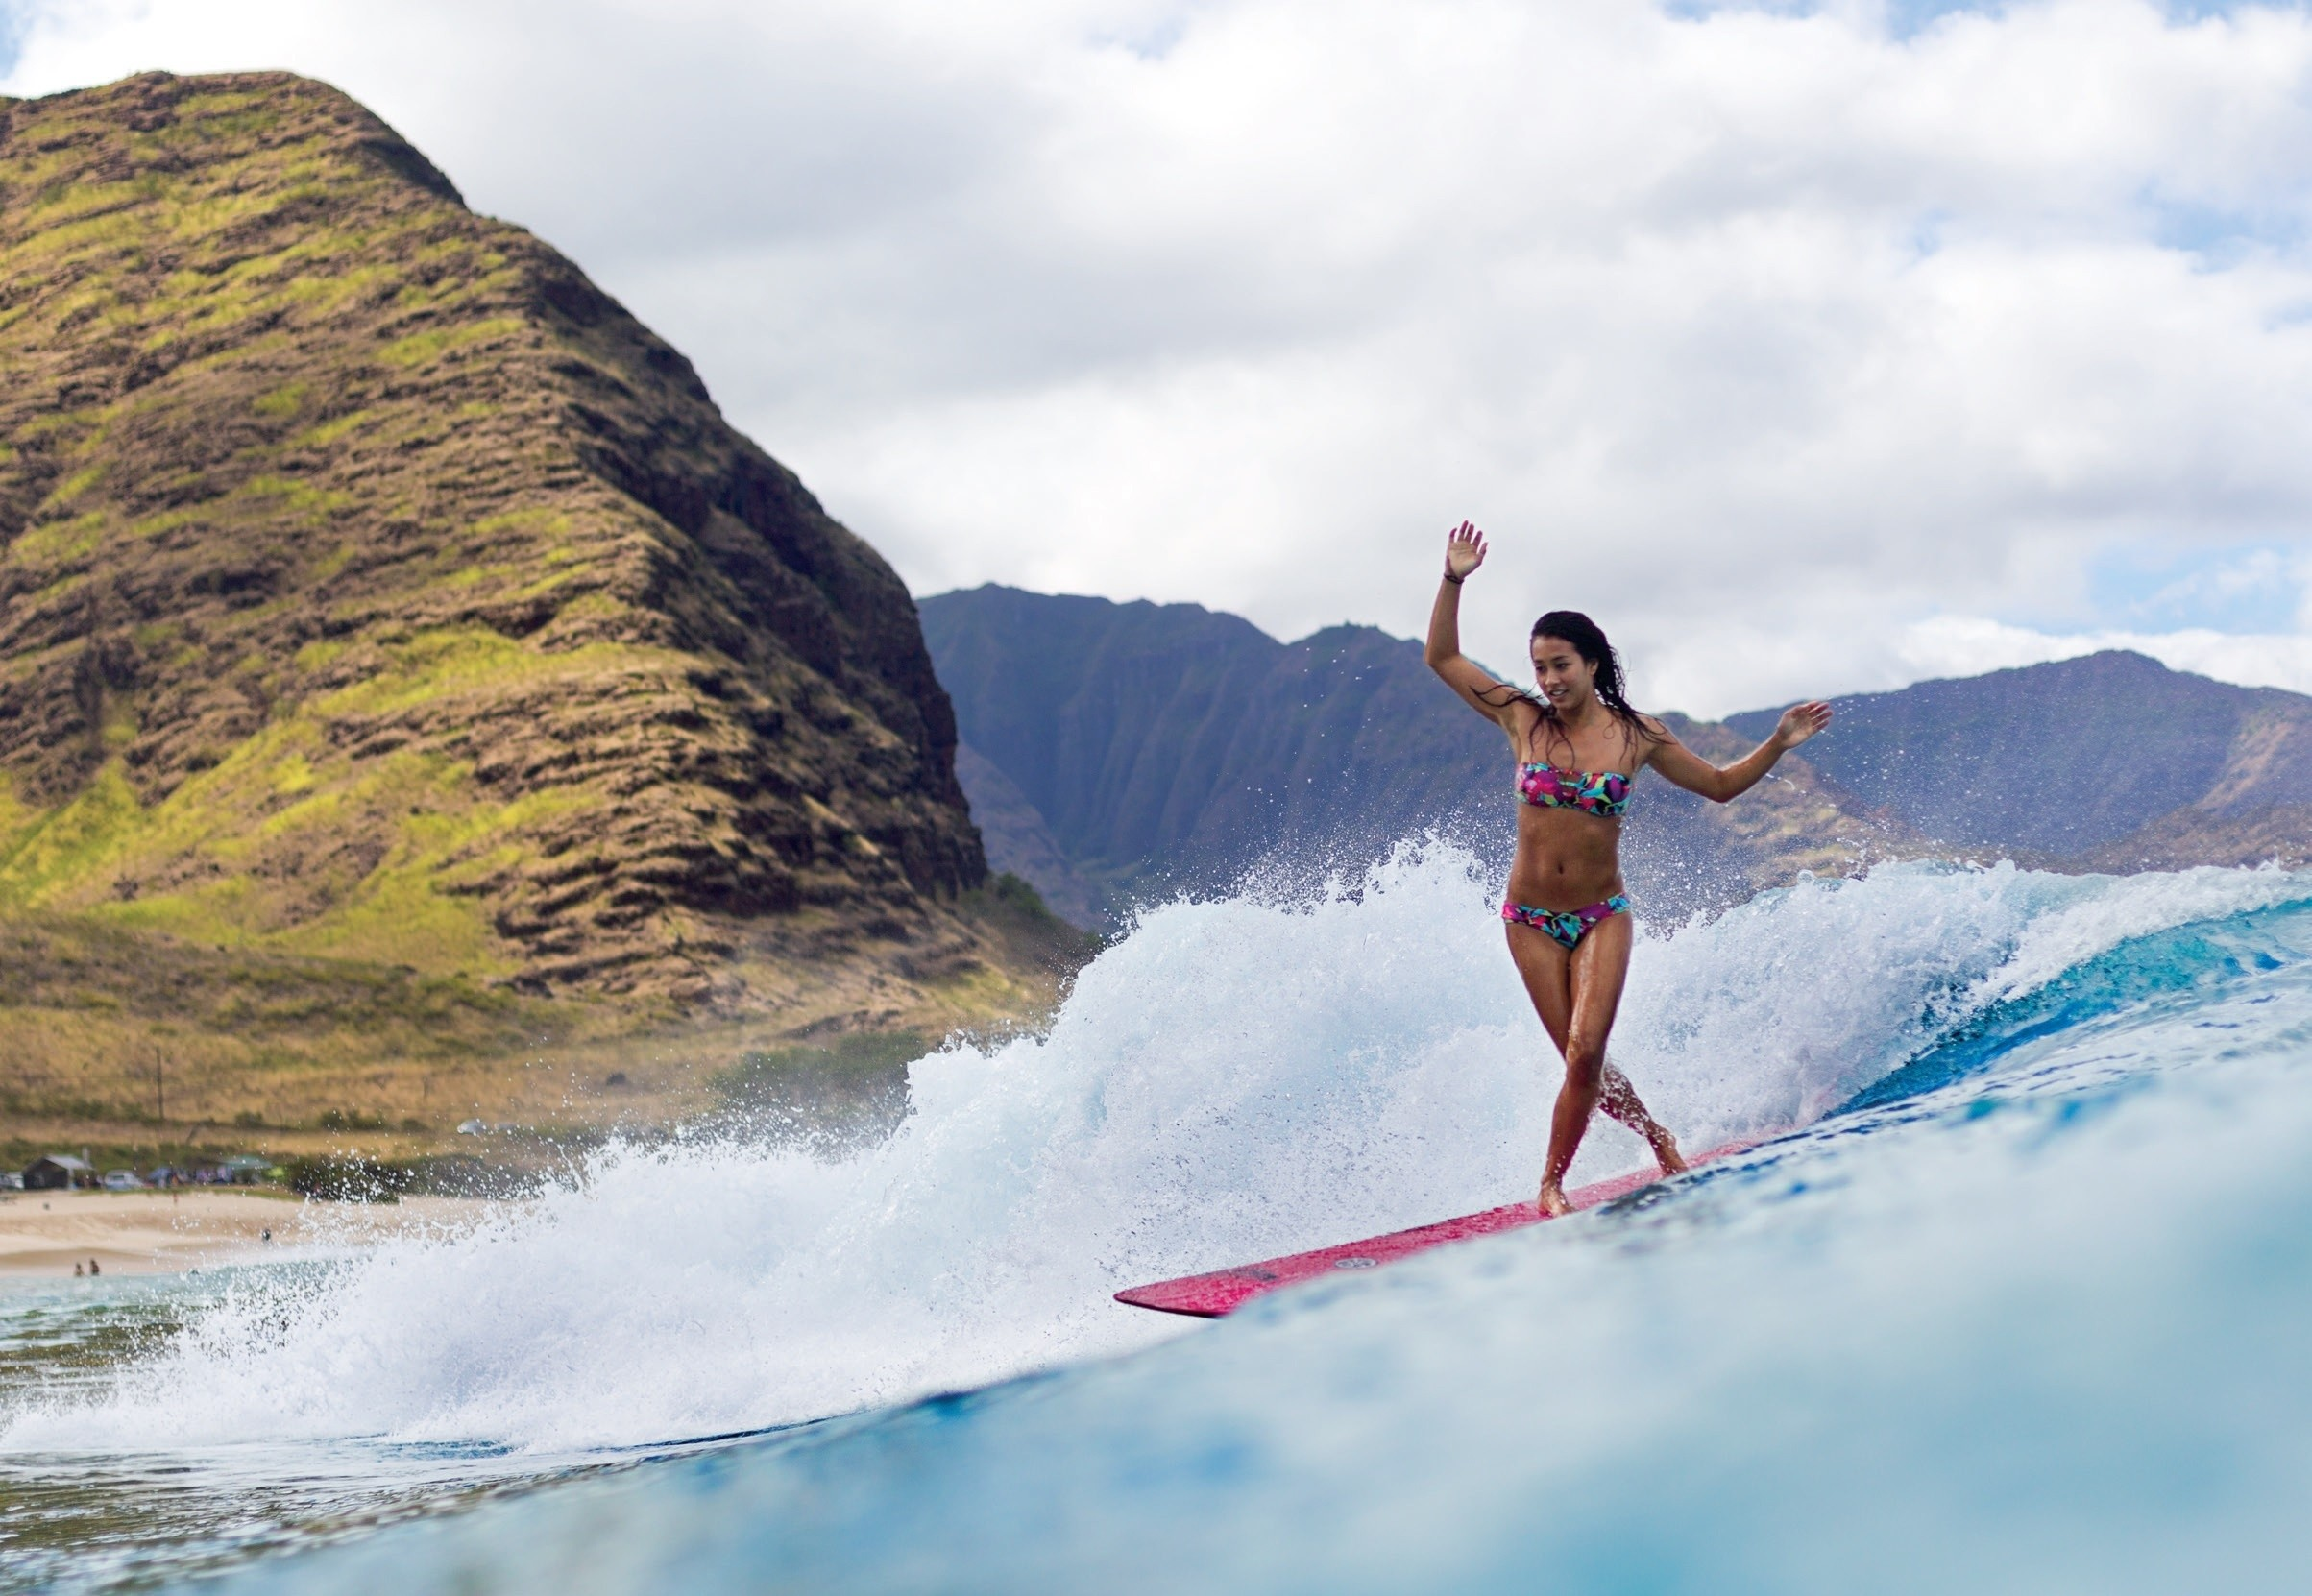 Surfing ocean girl surfing mountain r wallpaper | | 117561 .